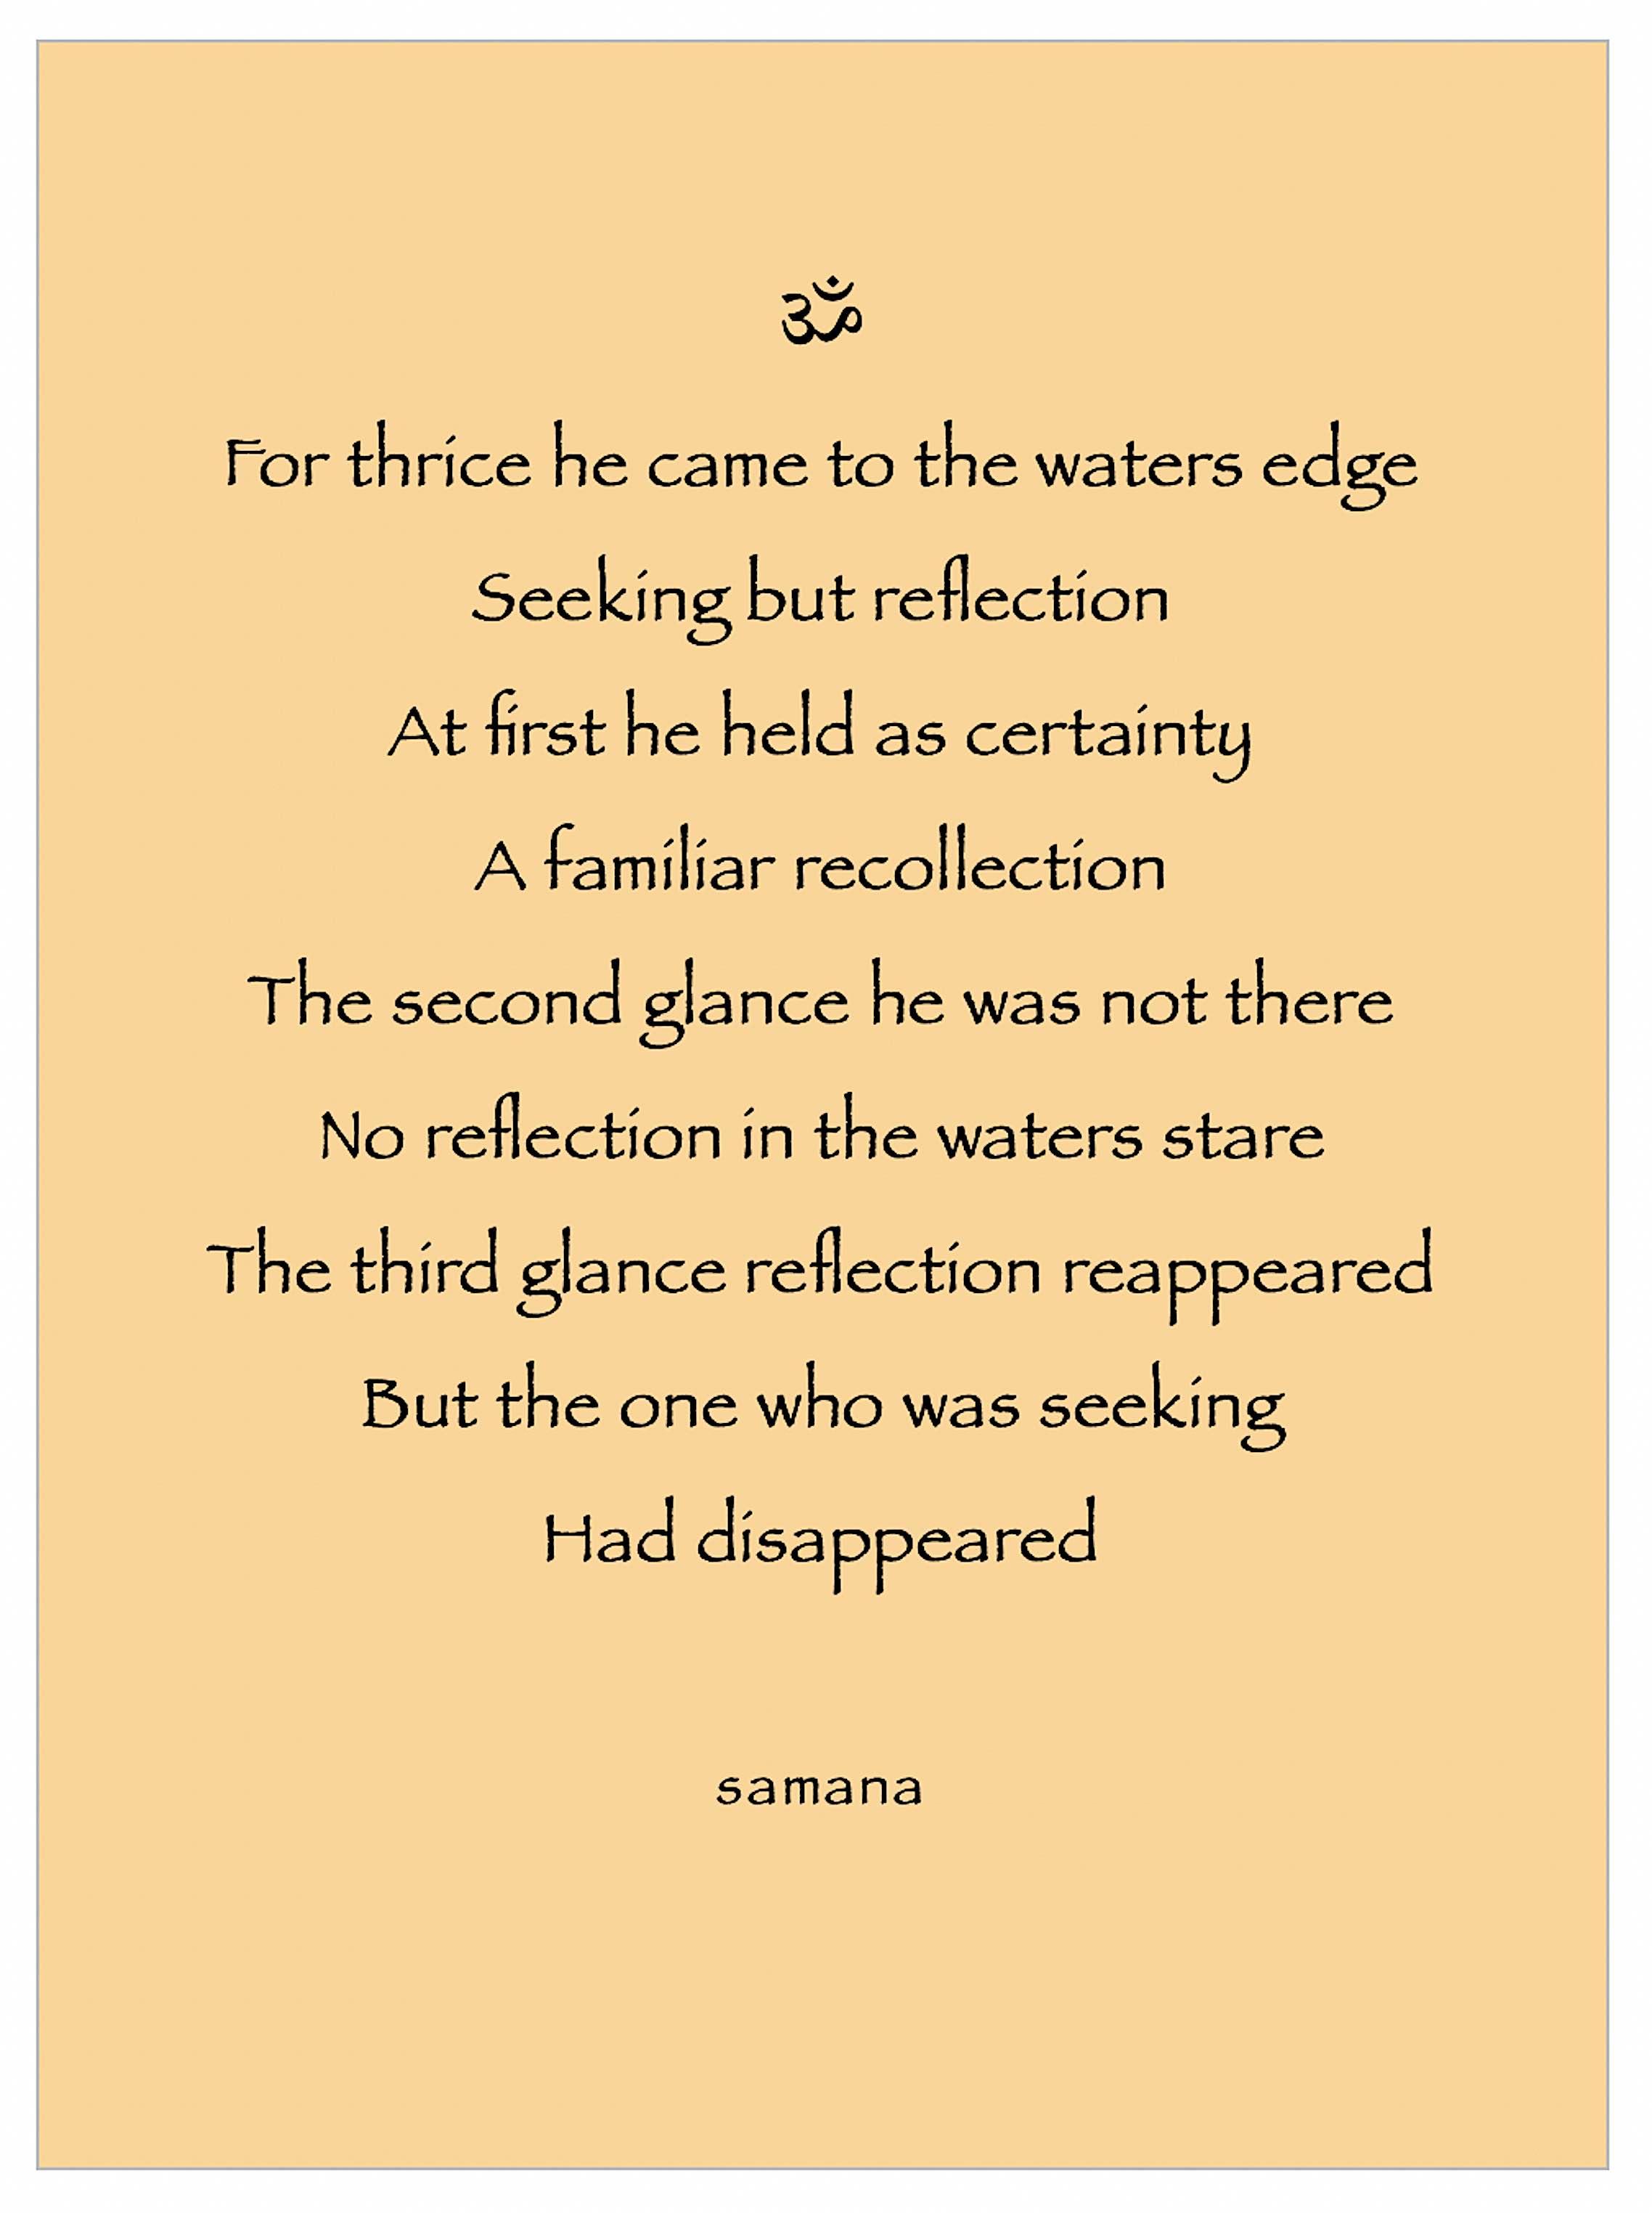 the waters edge ©samana-1.jpg